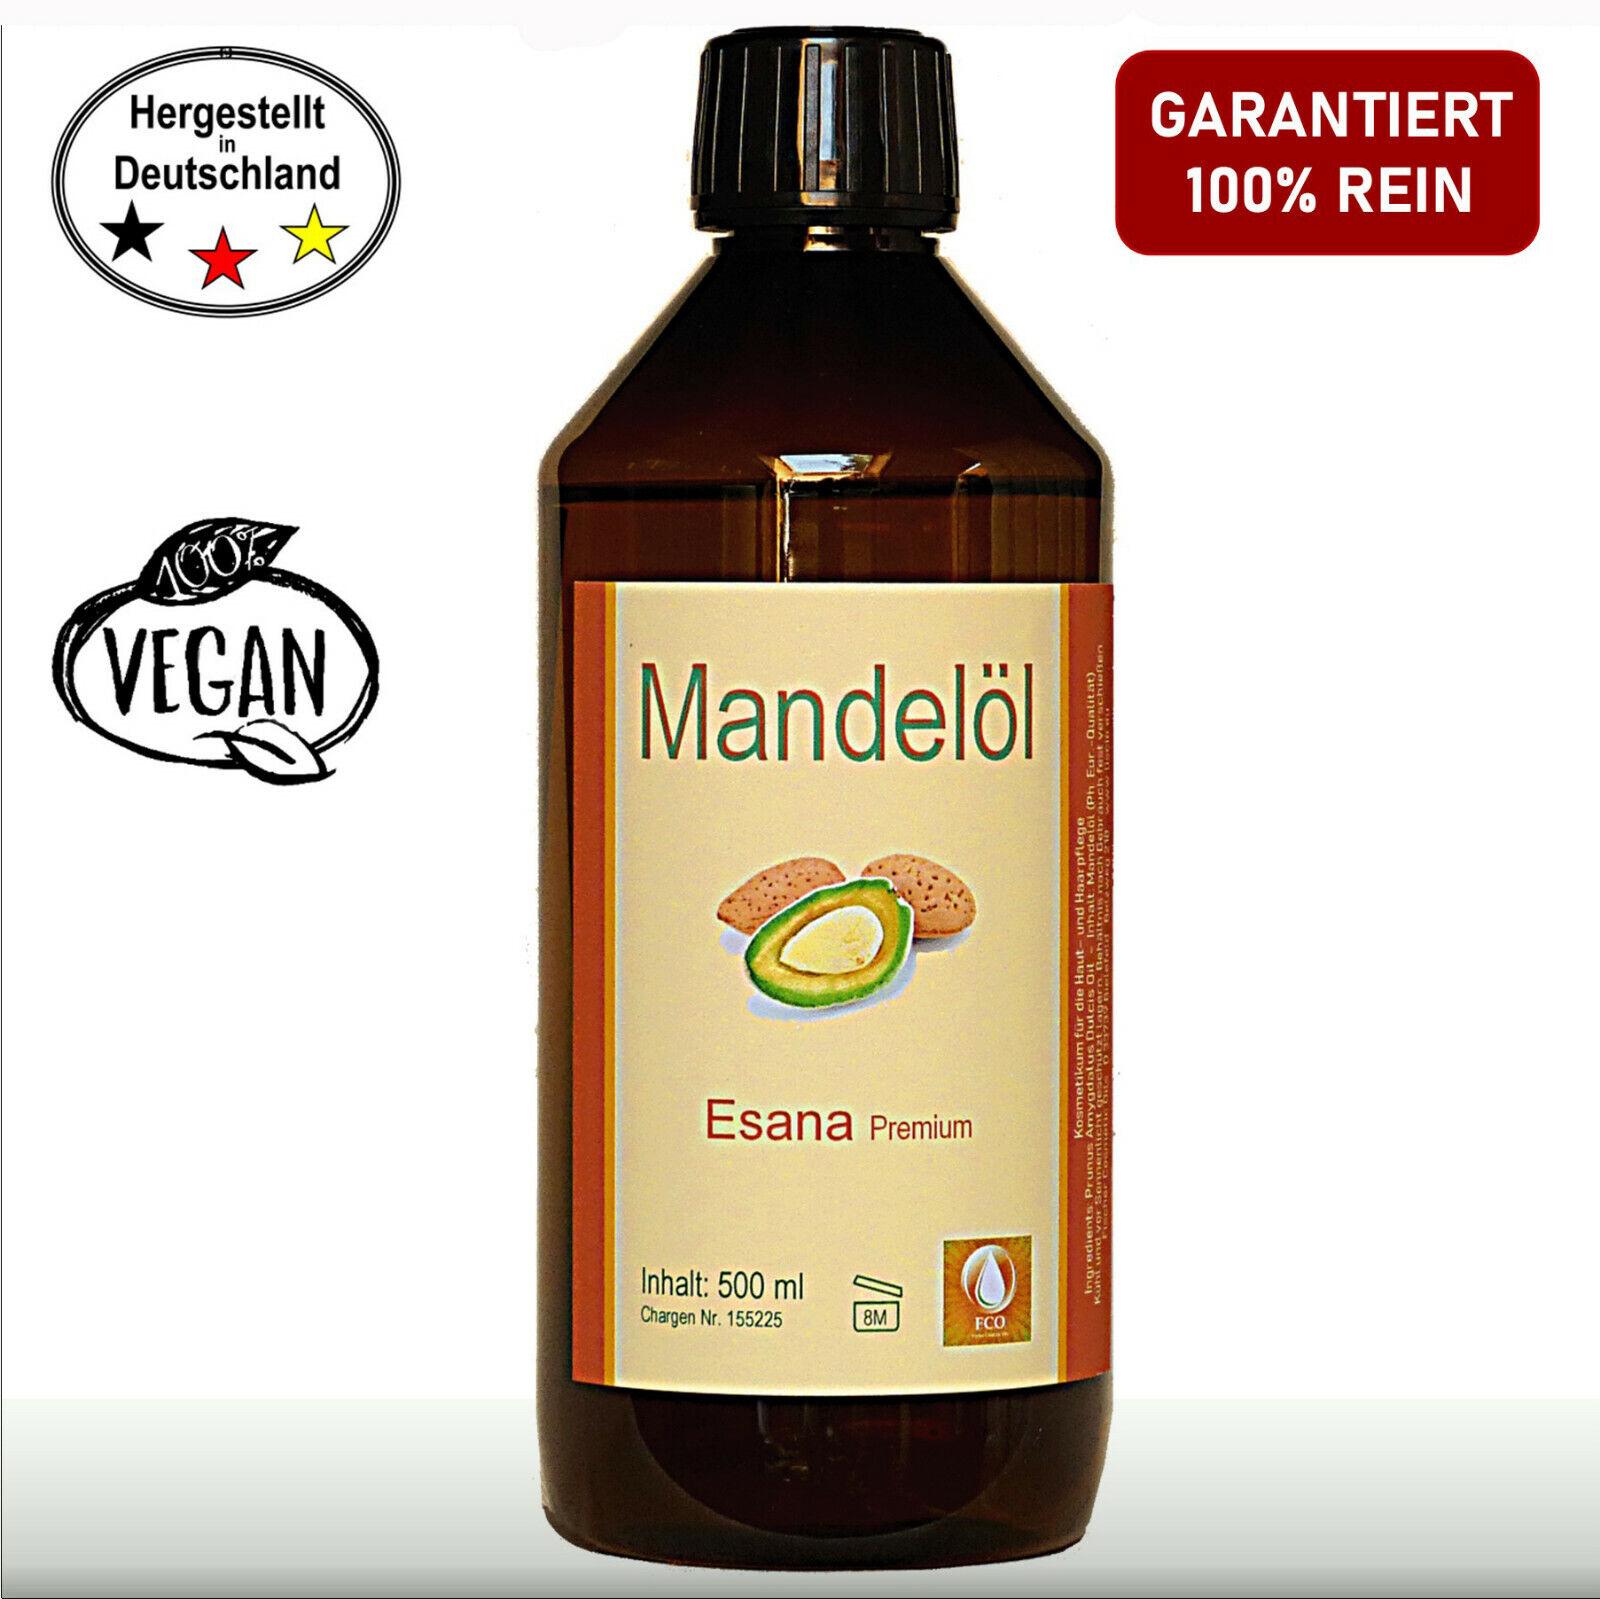 Mandelöl 500 ml süß,Qualitäts-Mandelöl rein für Hautpflege, Kosmetik, Massage